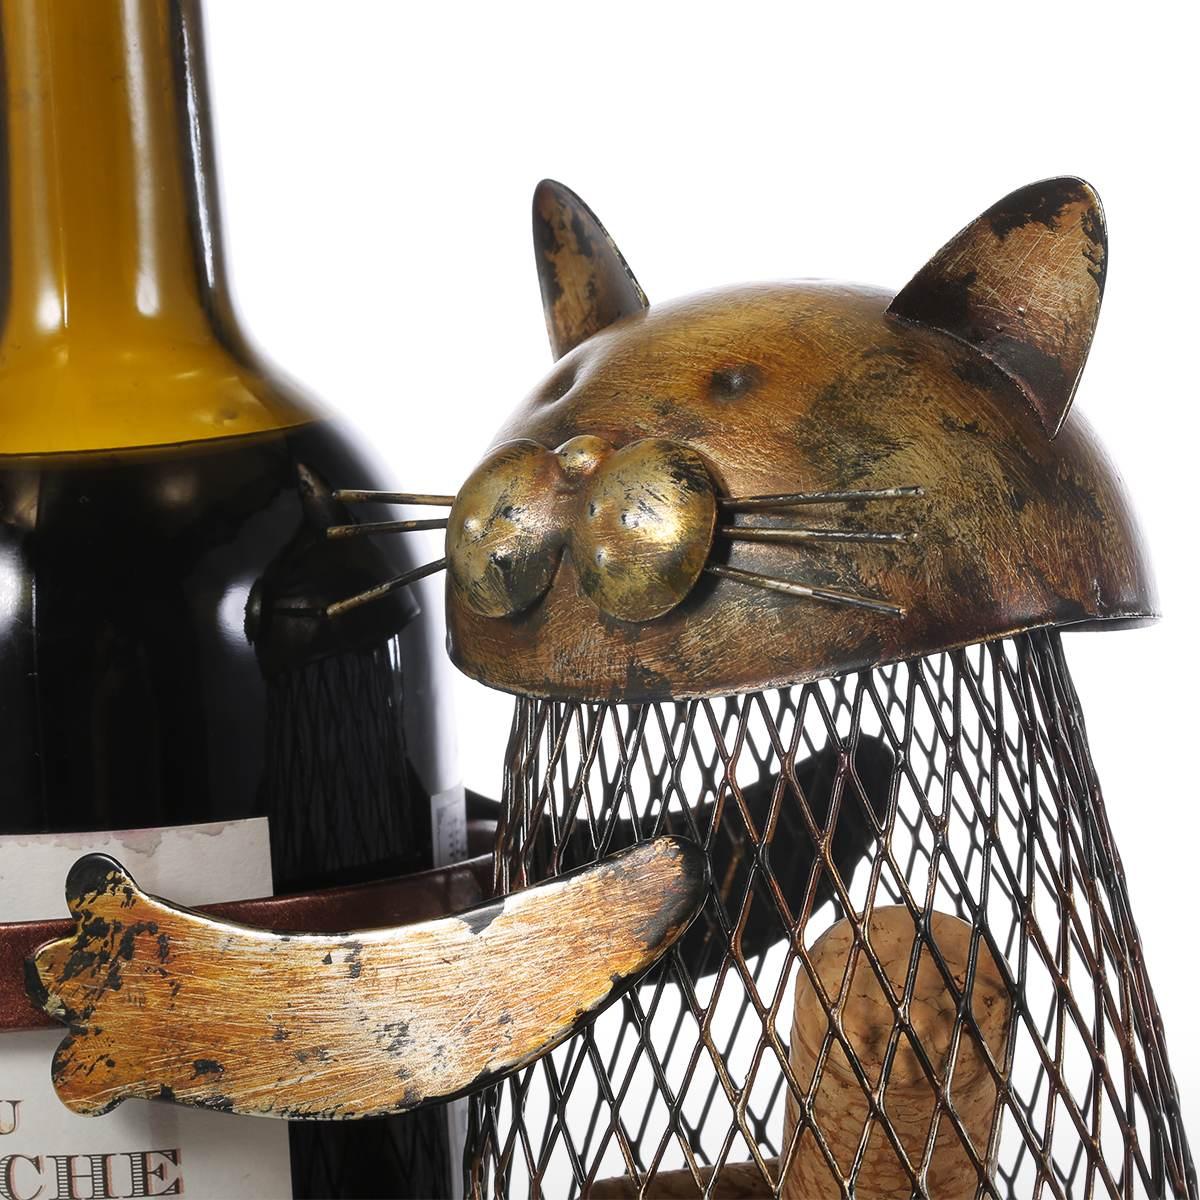 Tooarts Cat Wine Rack Cork Container Bottle Wine Holder Kitchen Bar Metal Wine Craft Christmas Gift Handcraft Animal Wine Stand 16